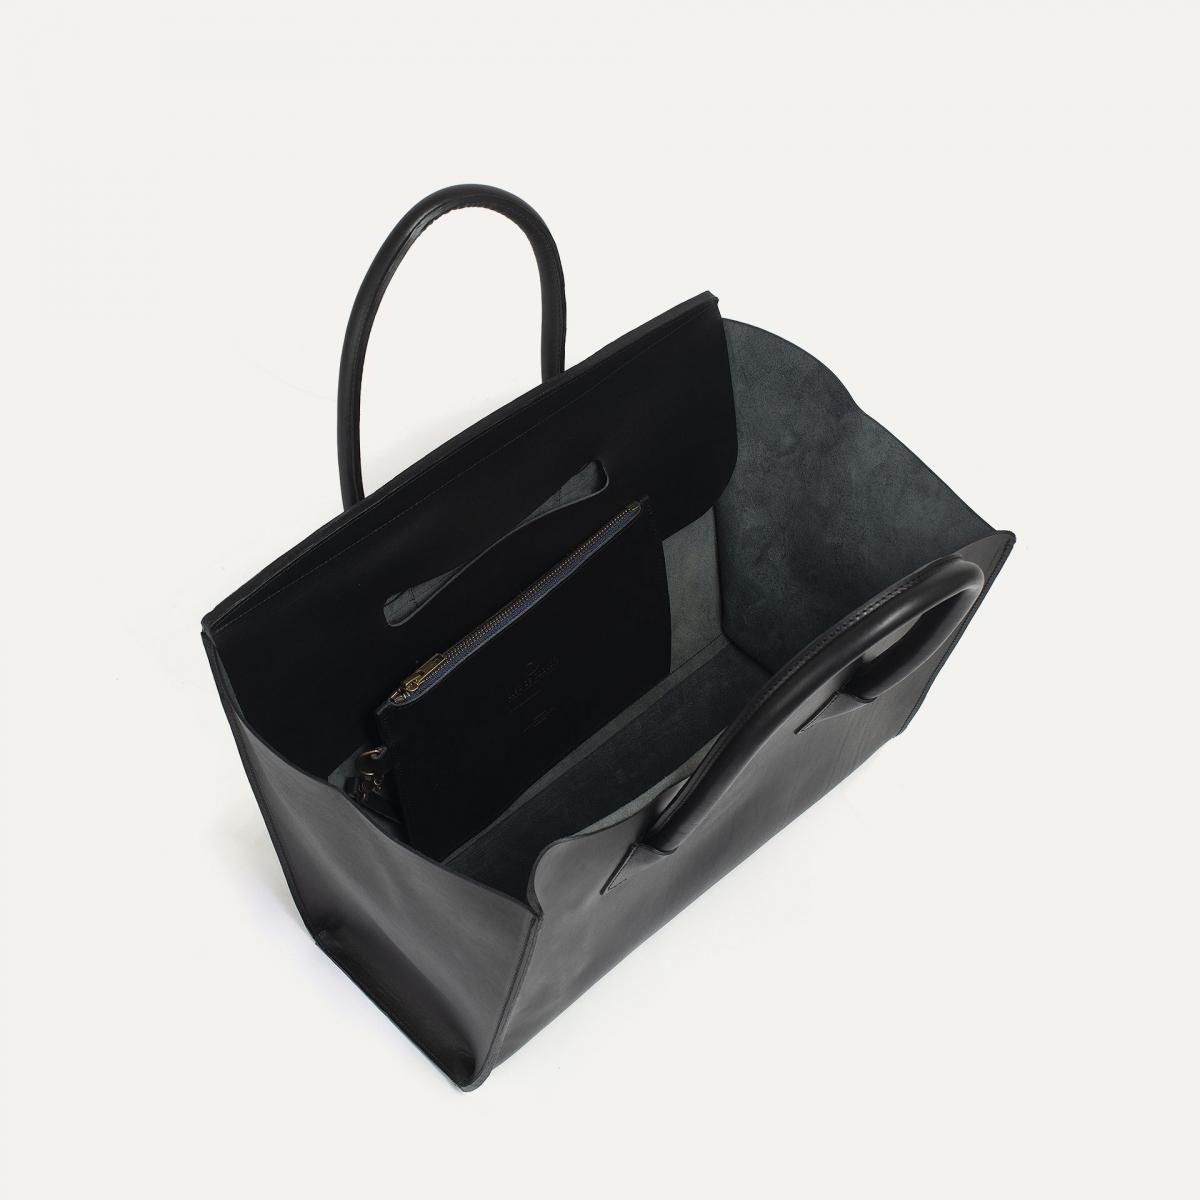 Origami L Tote - Black (image n°4)